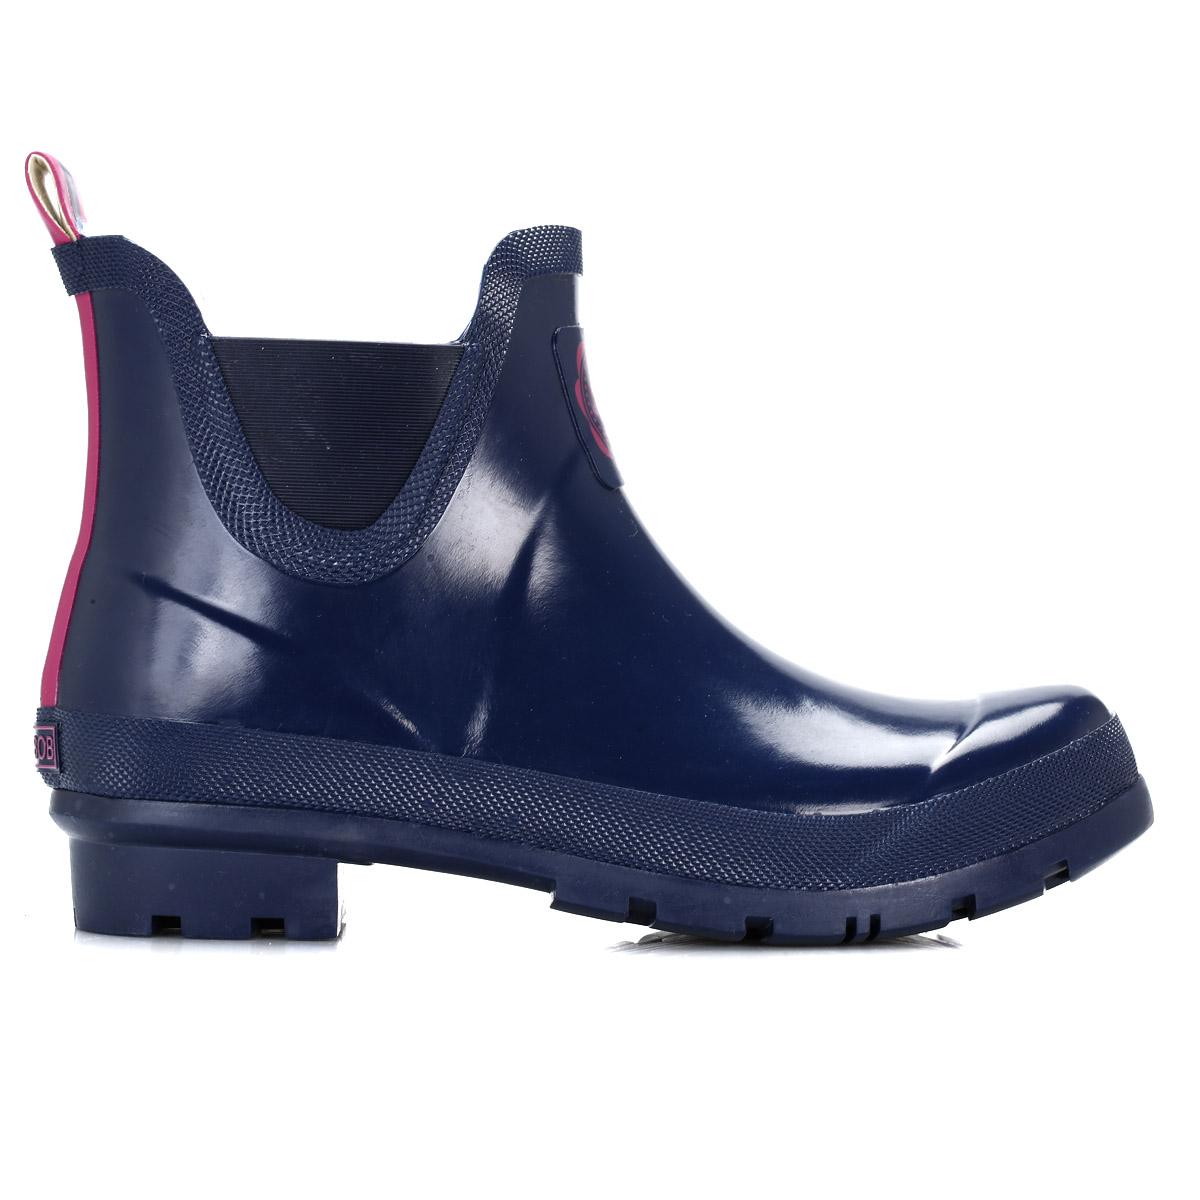 joules womens boots navy blue wellibob wellington